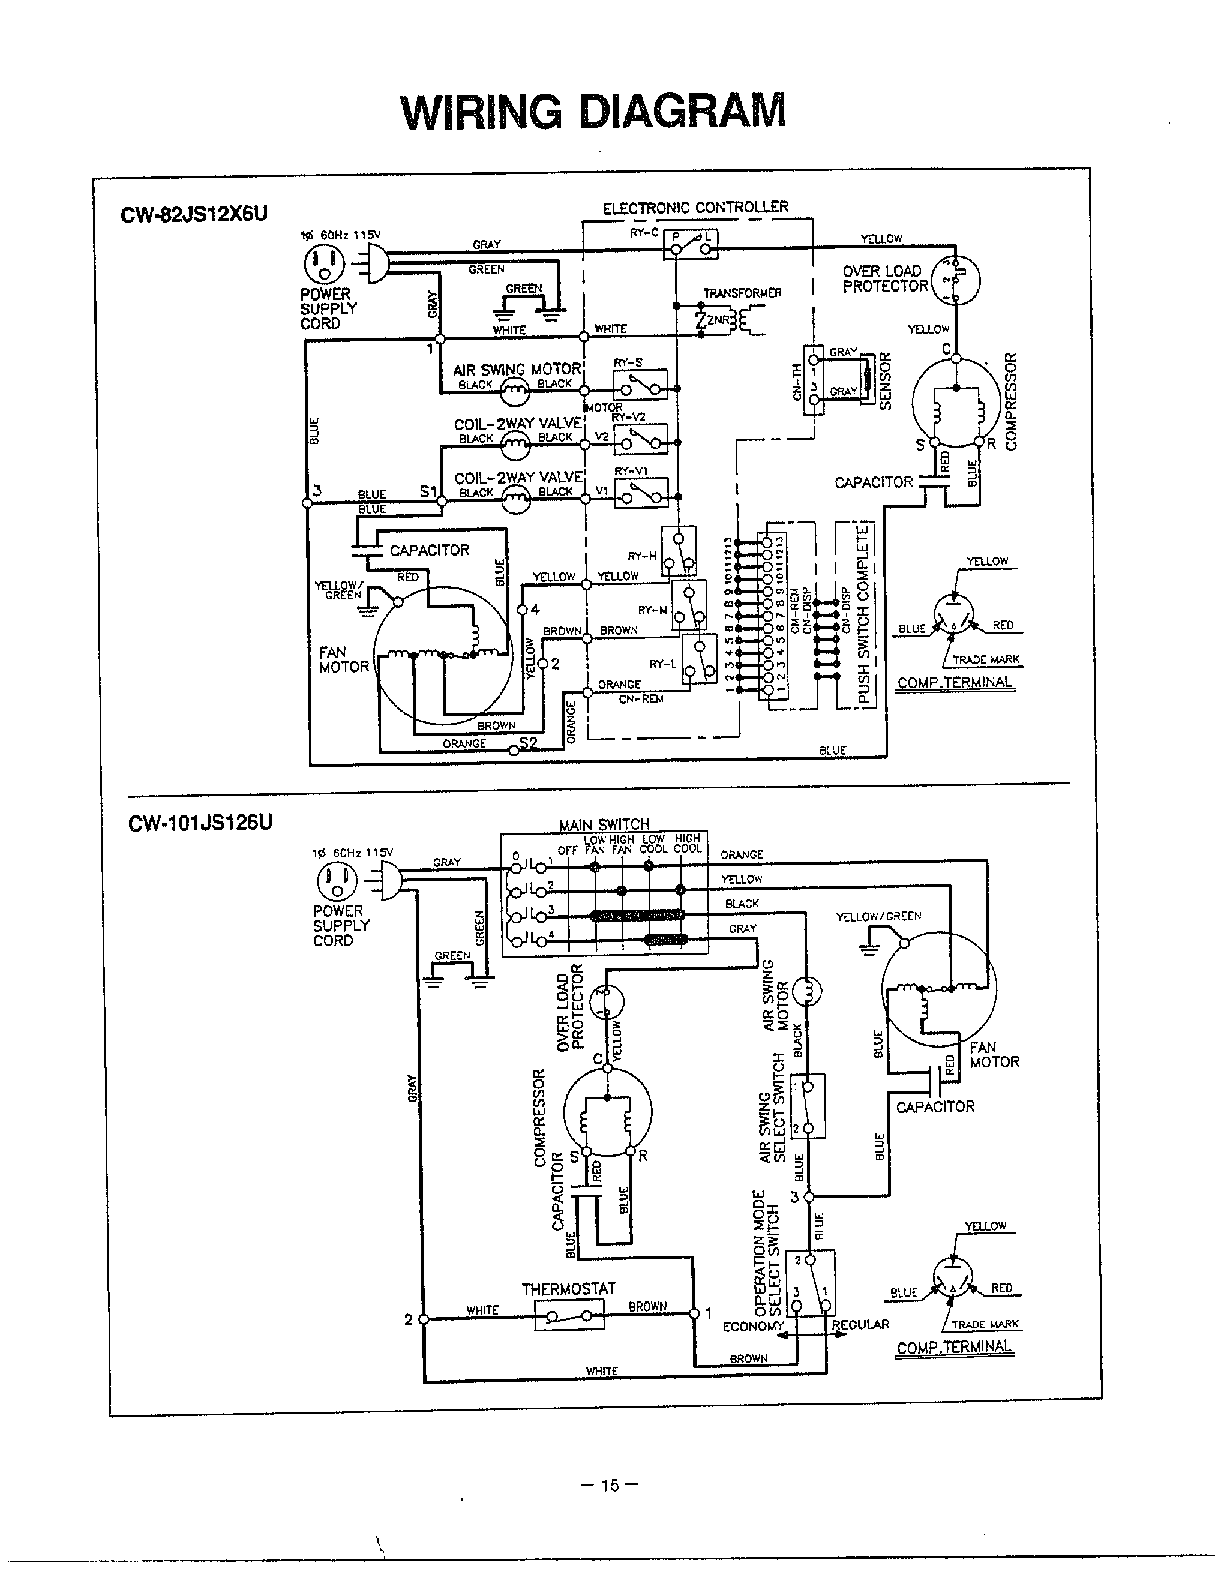 Mc400 Solenoid Wiring Diagram Ezgo Gas Workhorse Manual E Books 2000 Diagrams Simple Diagrammc400